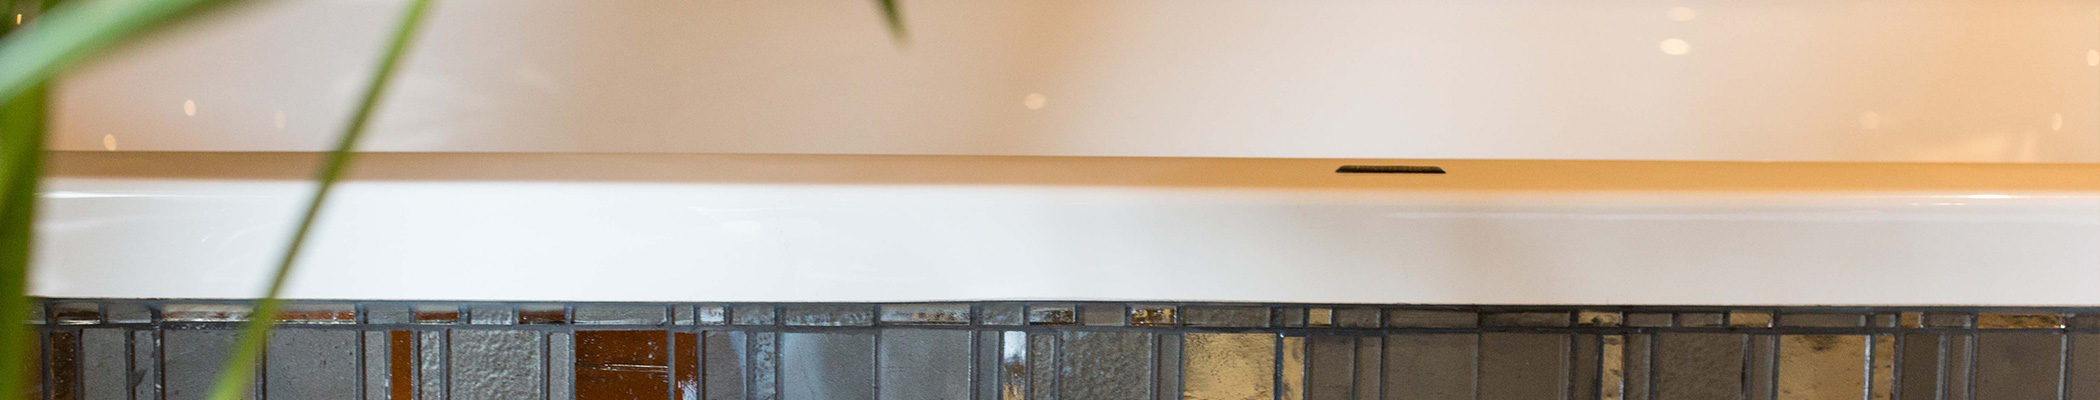 boutique-hotel-zaandam-manzo-badkamer-detail-tegel-plant